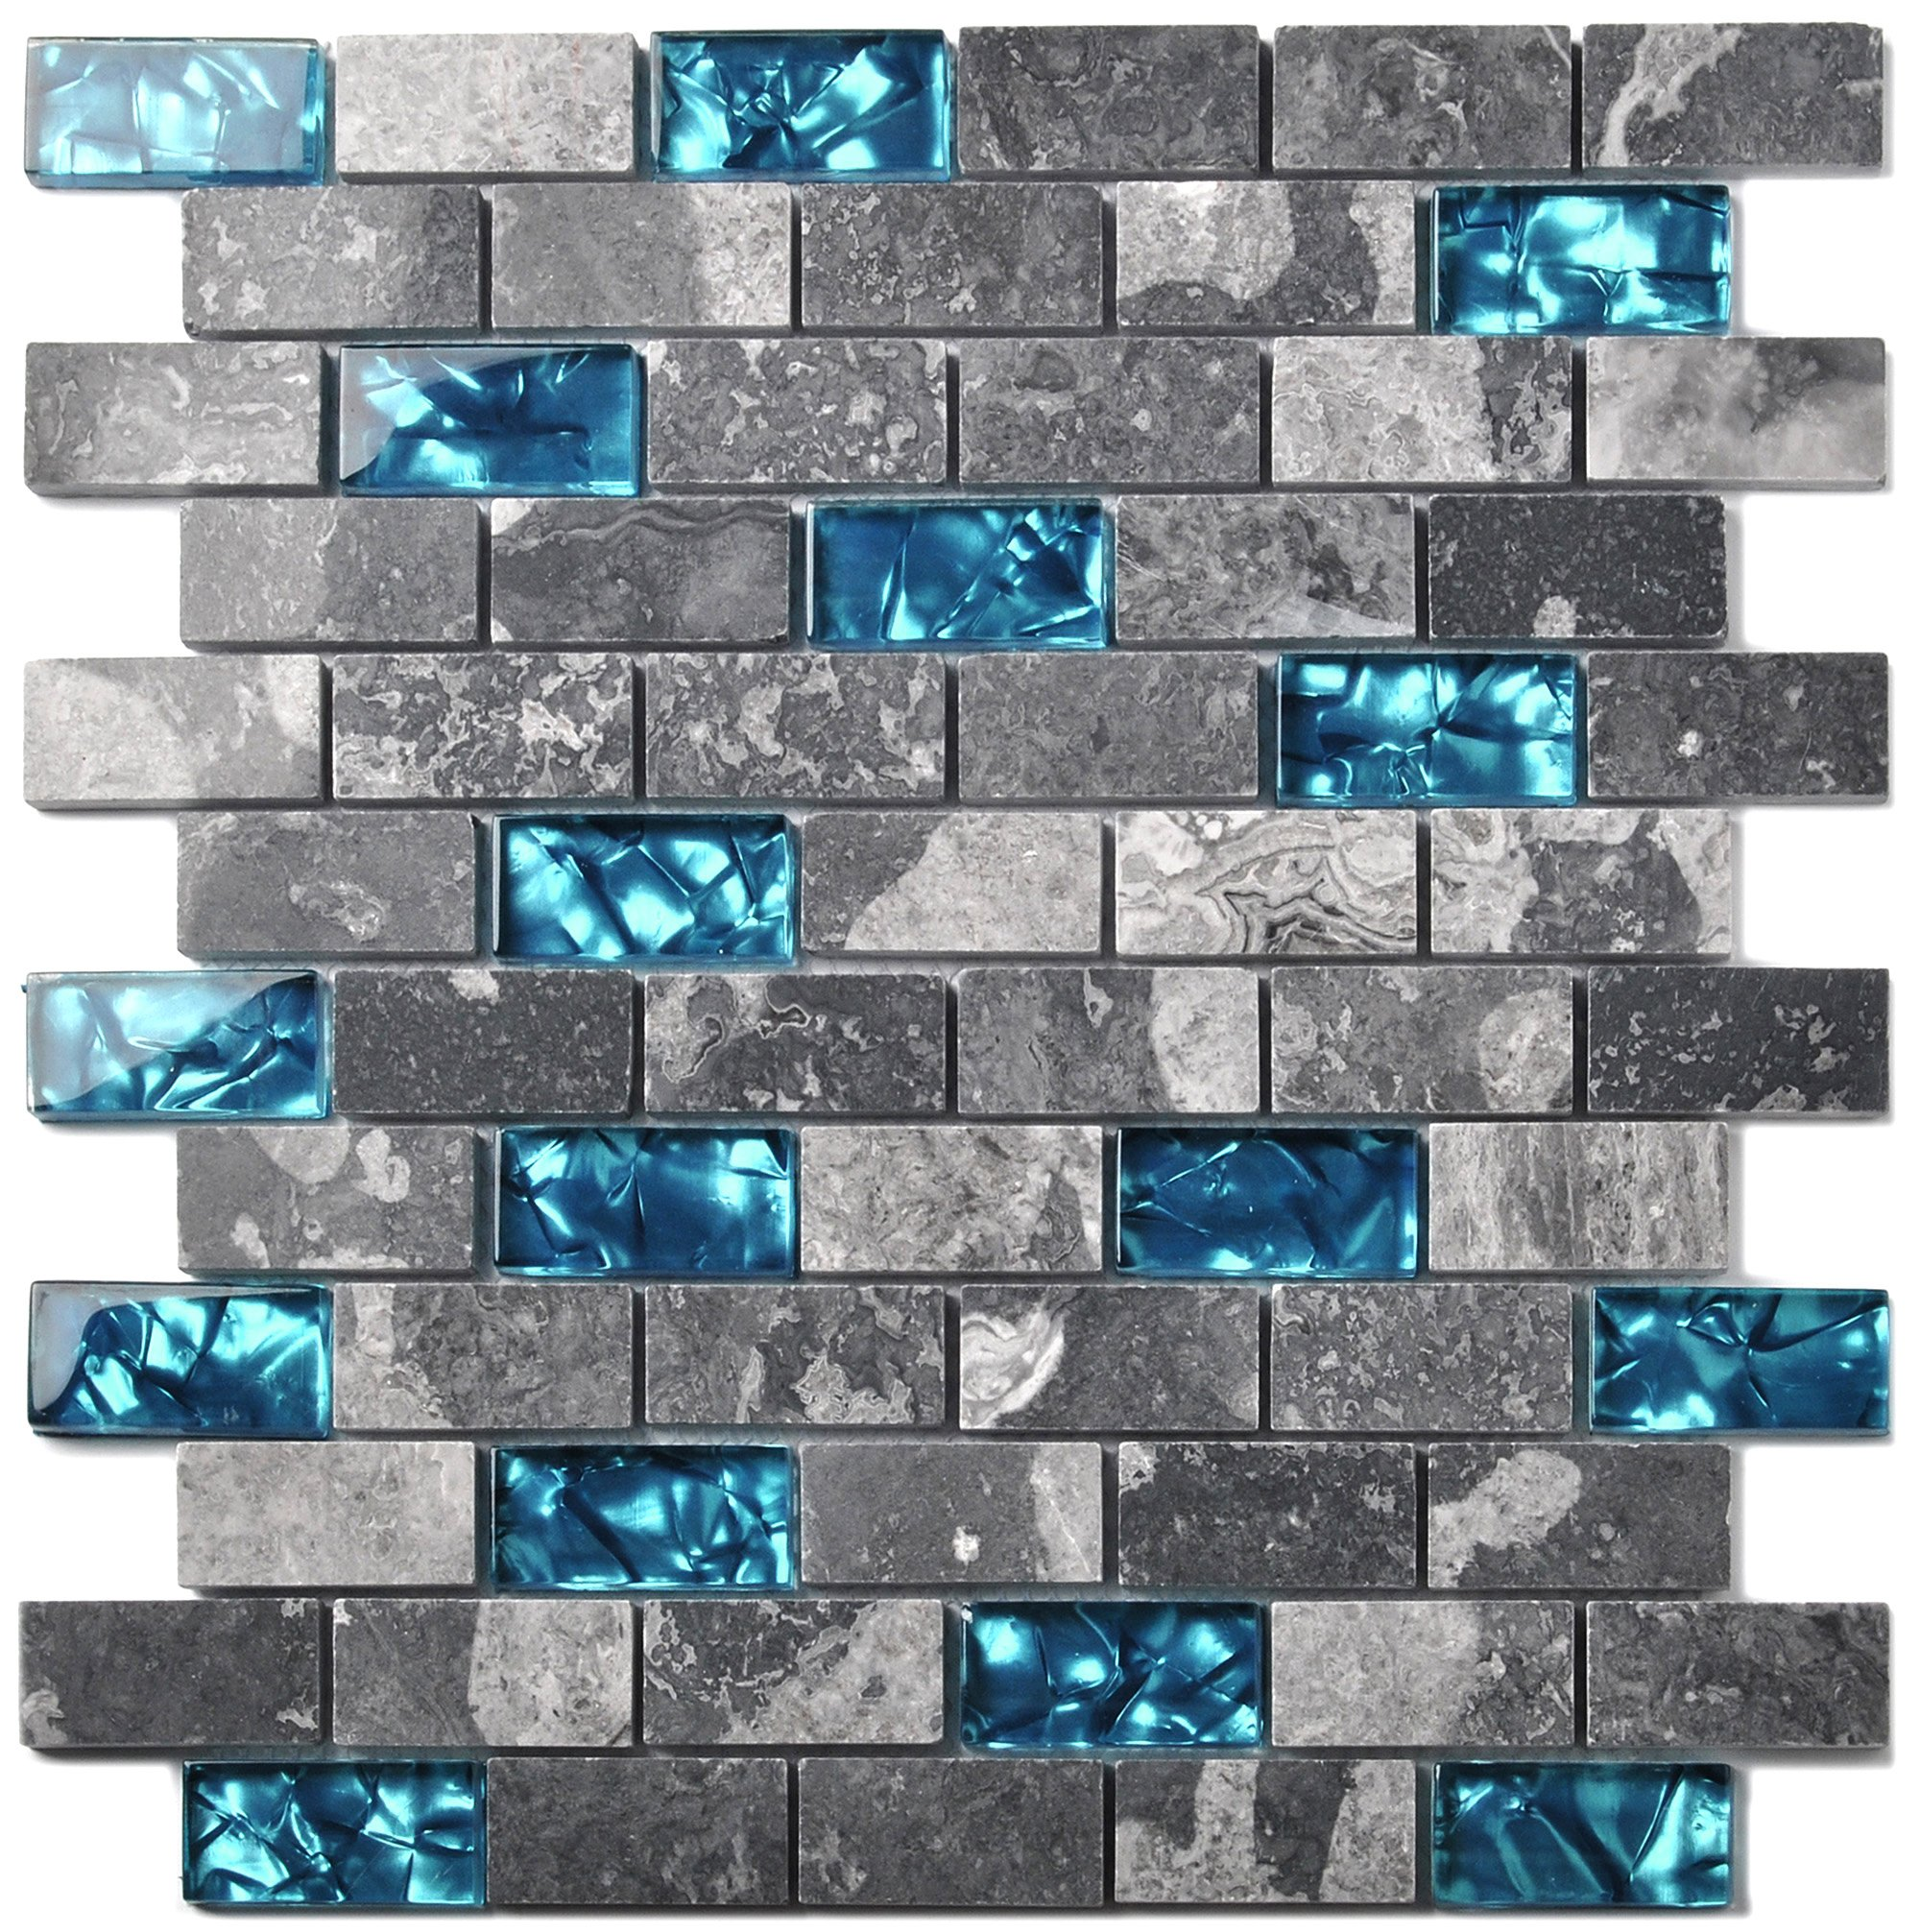 Ocean Teal Blue Glass Nature Stone Tile Kitchen Backsplash 3D Bath Shower  Accent Wall Decor Gray